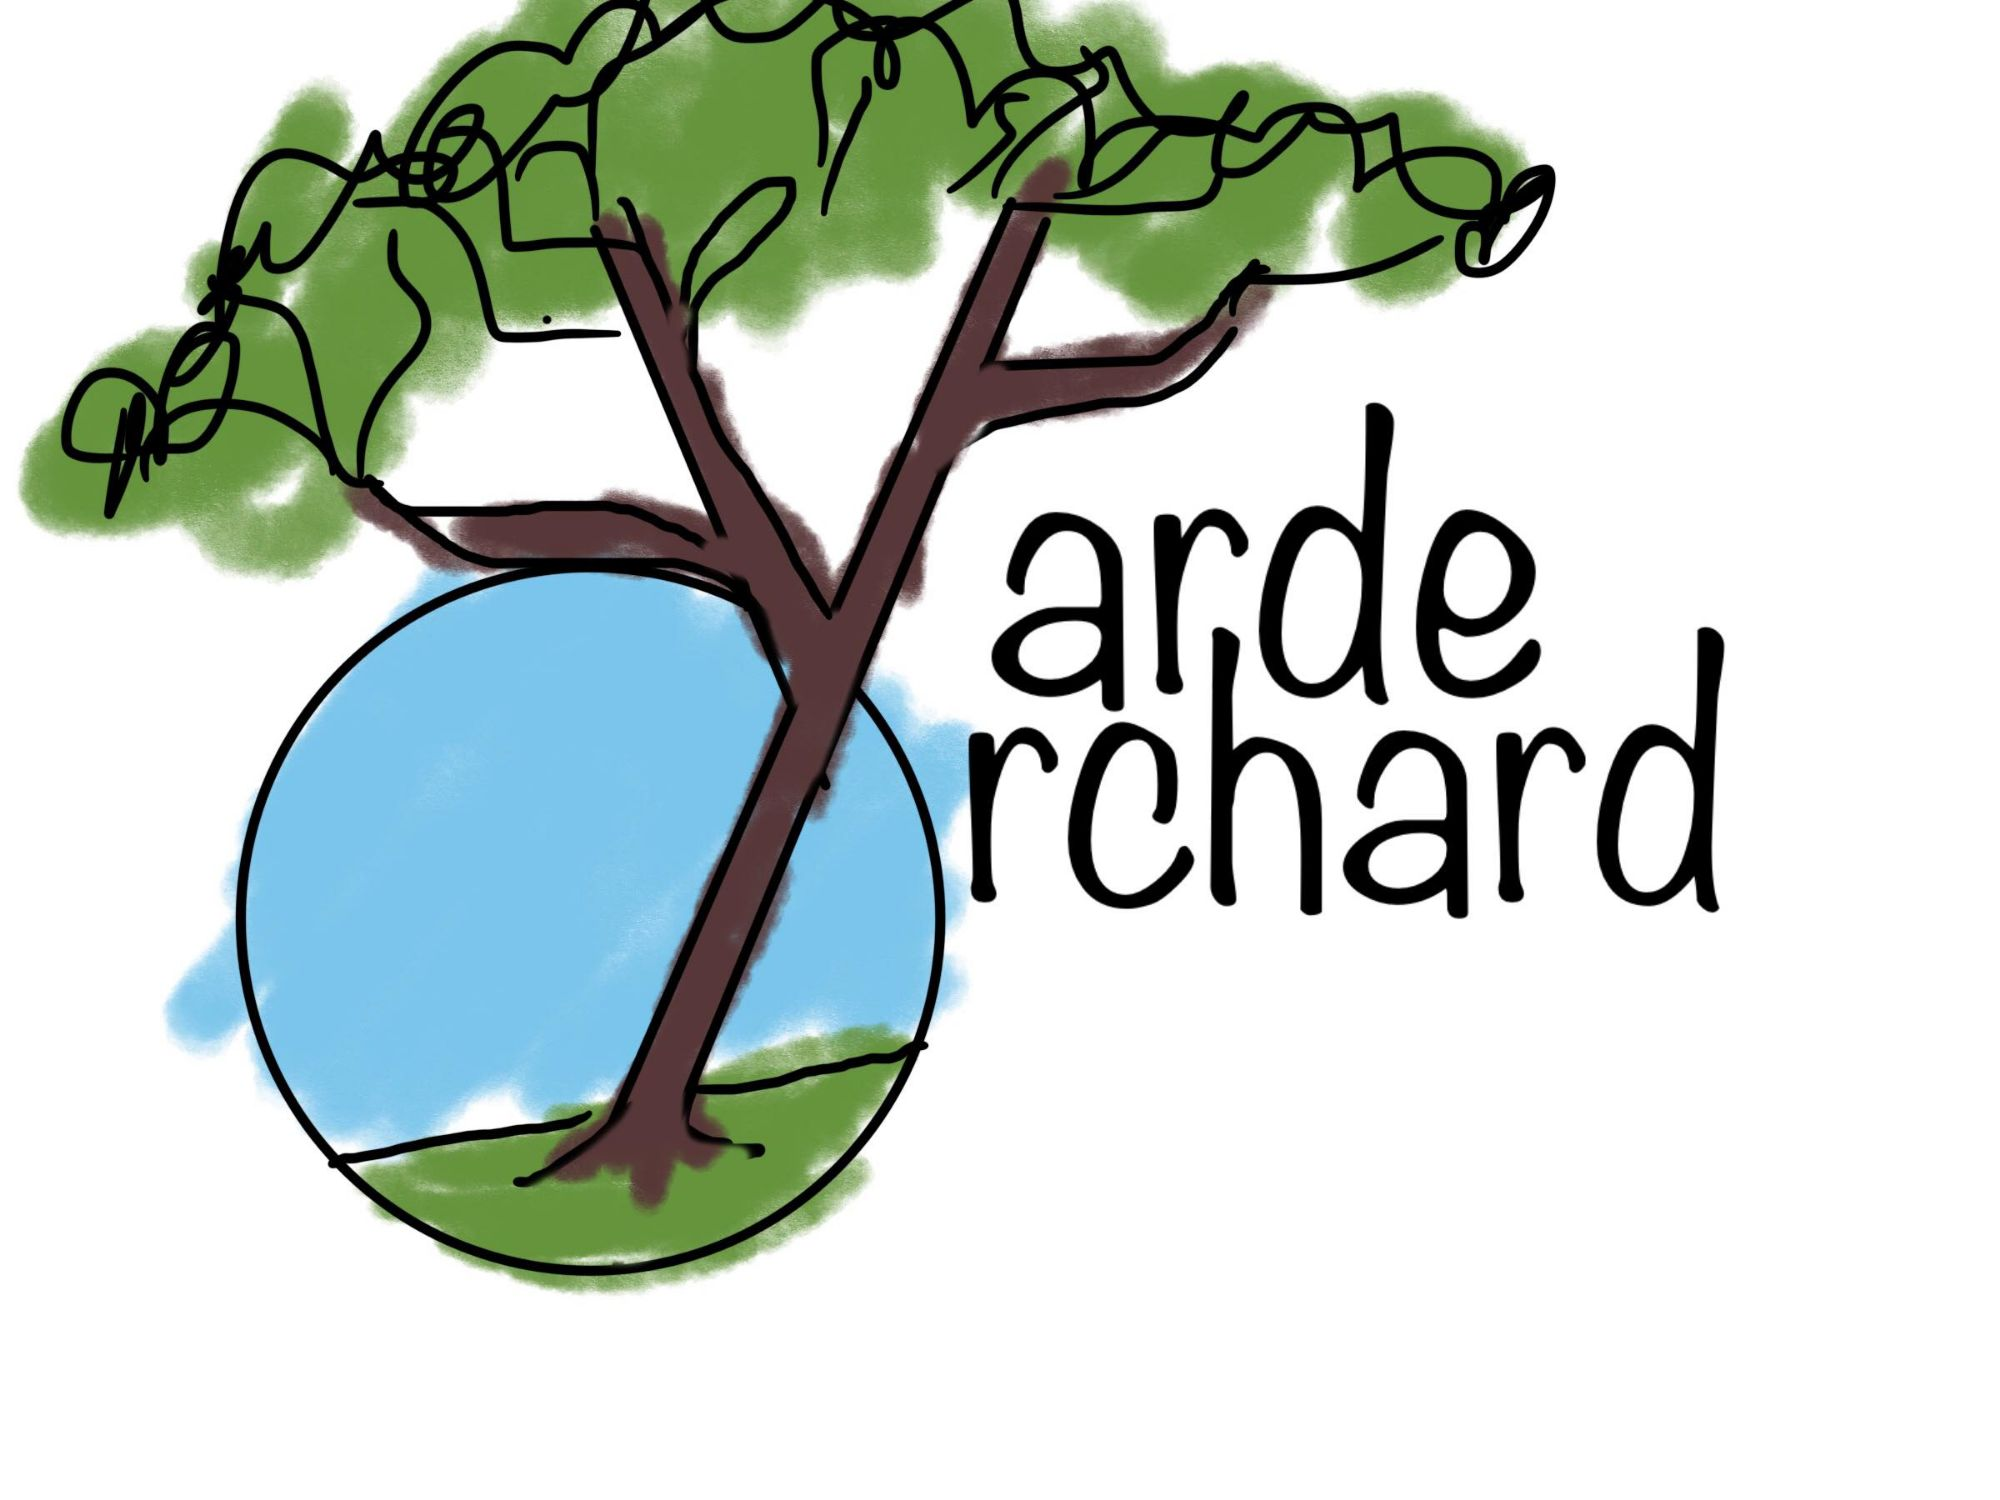 Yarde Orchard